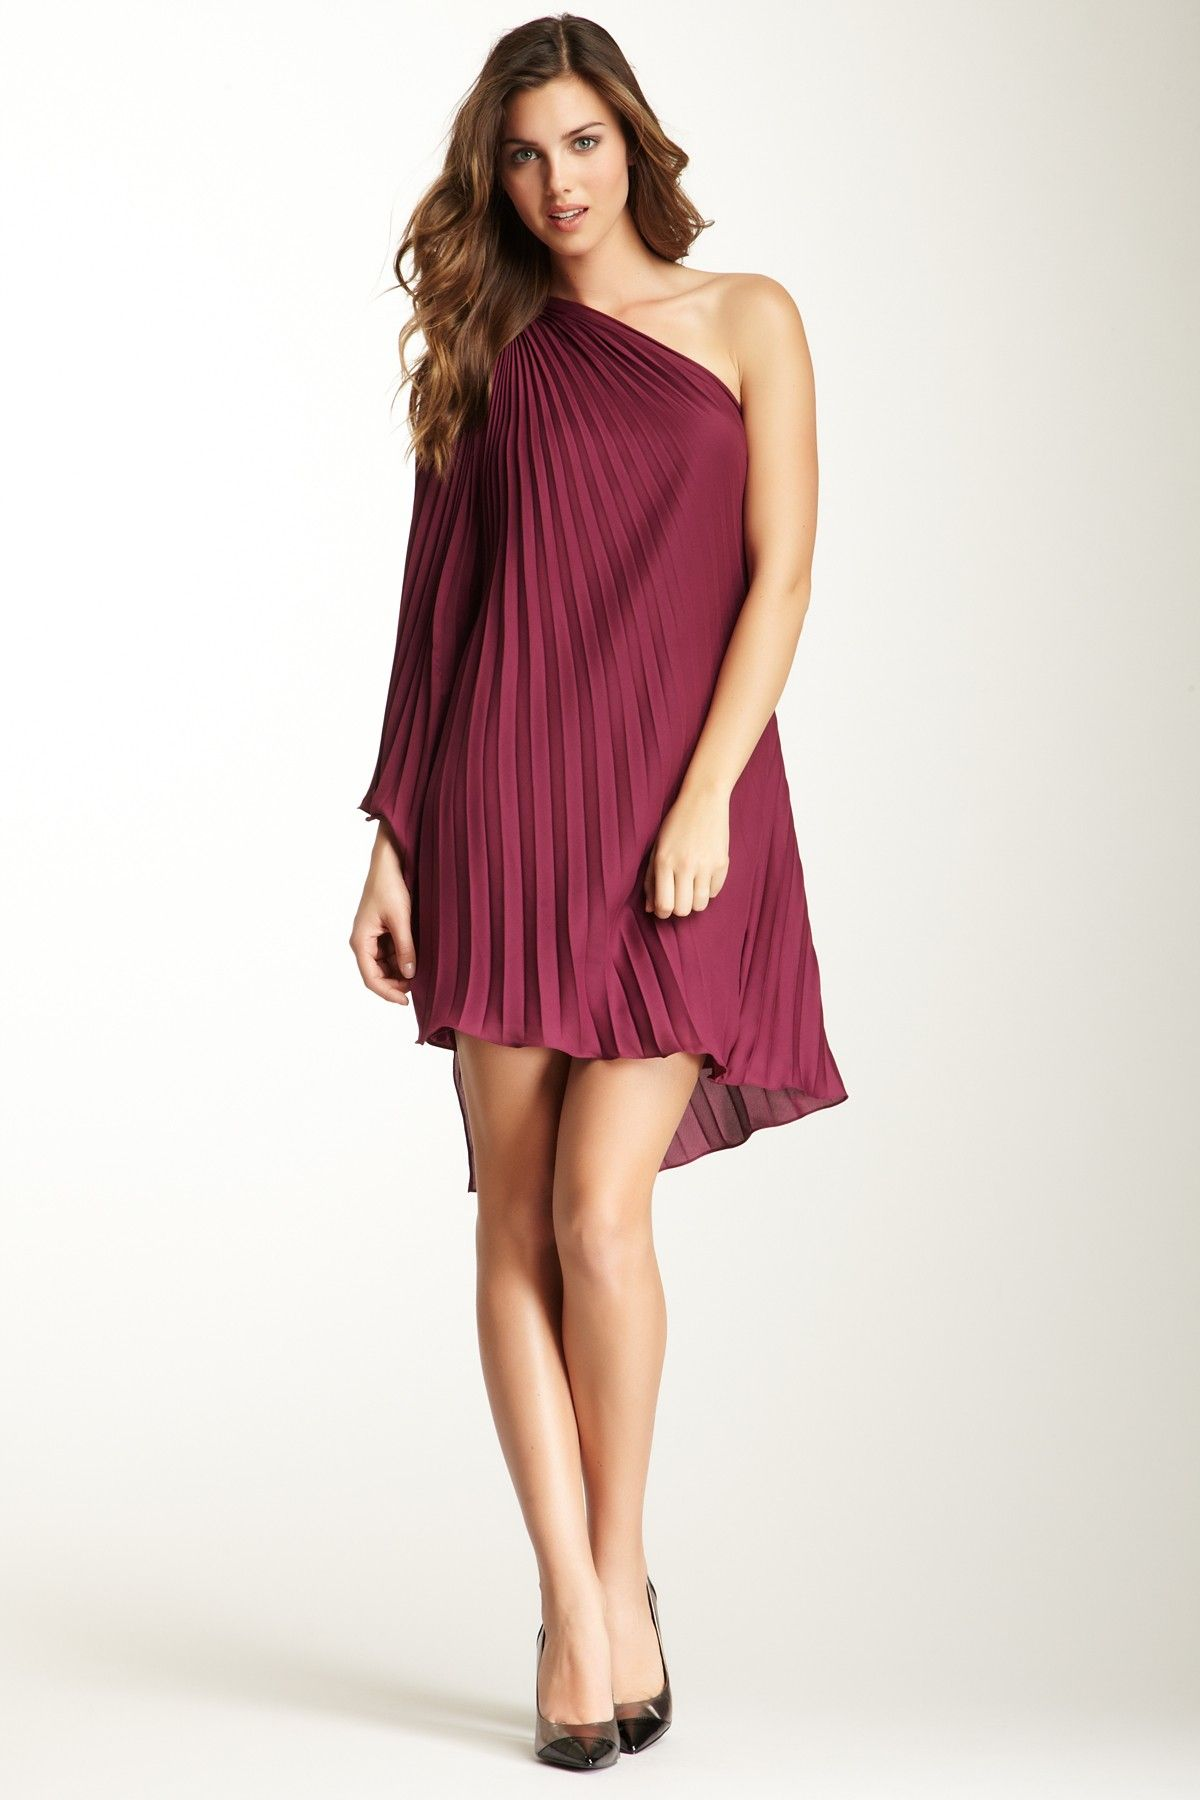 Halston Heritage One Shoulder Pleated Dress | My Dream ...